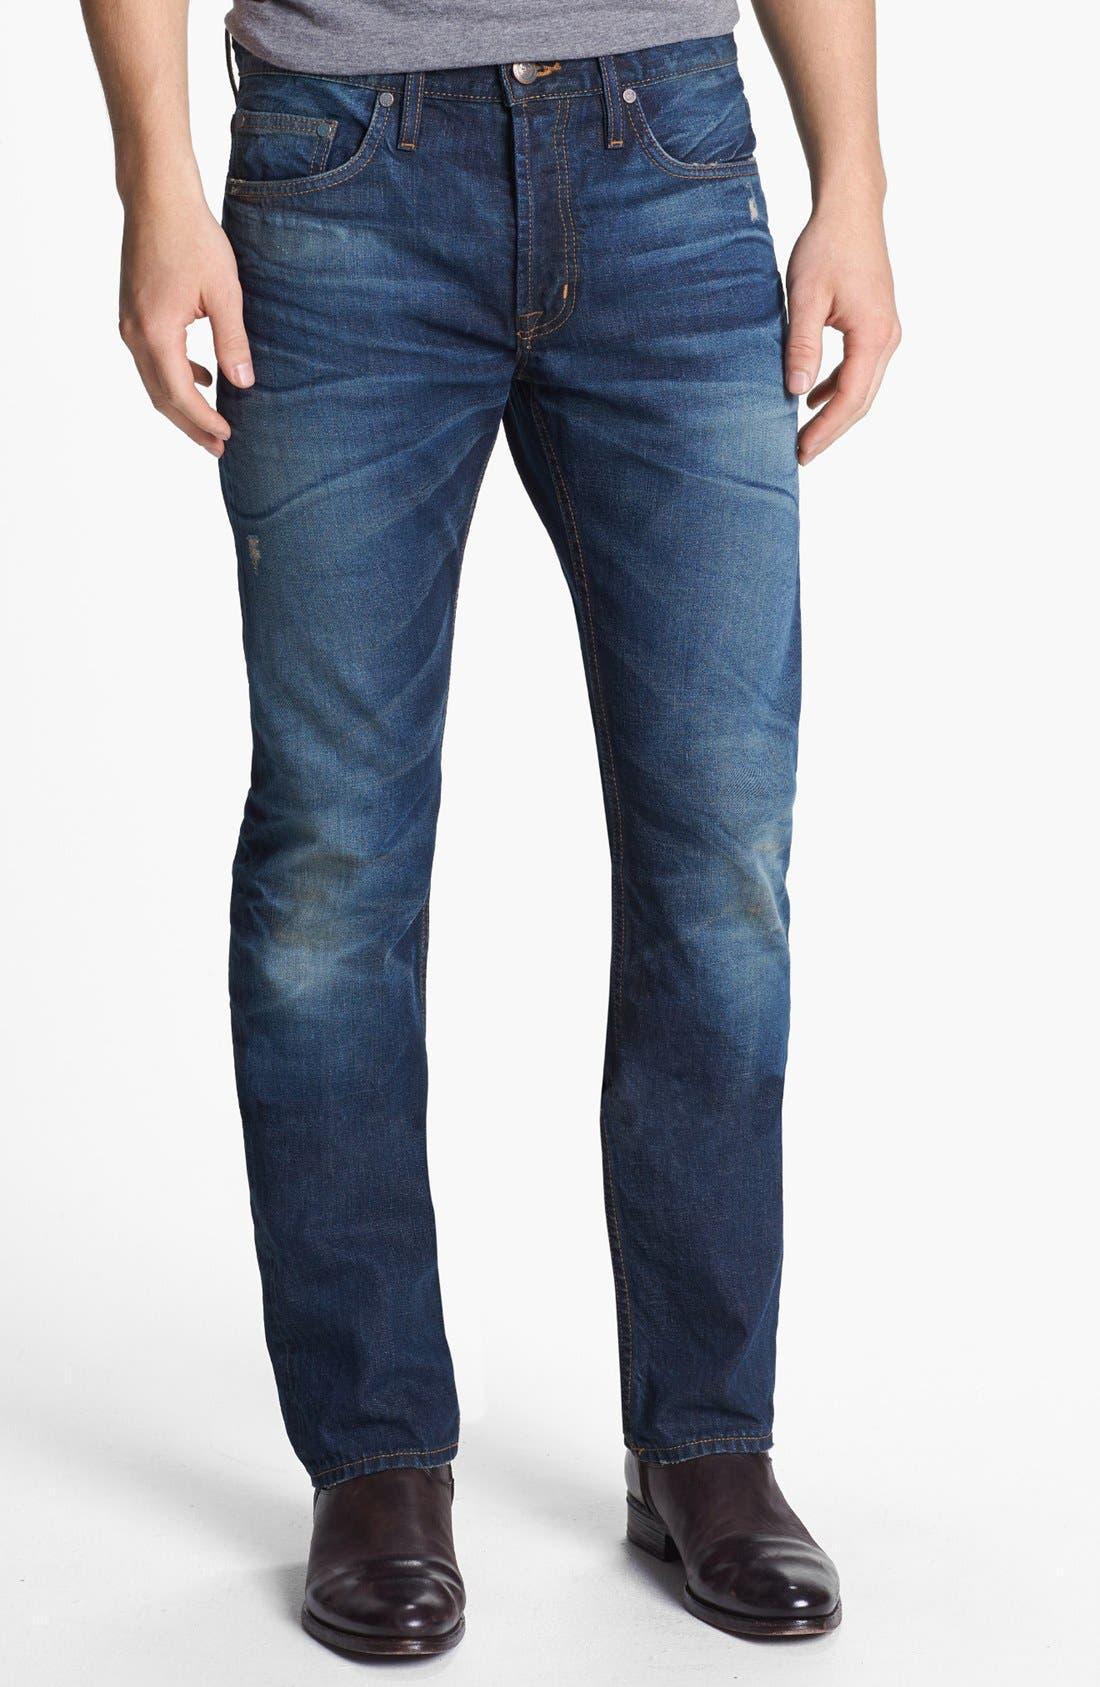 Alternate Image 1 Selected - Asbury Park '1874 Monte Carlo' Straight Leg Selvedge Jeans (Ocean Grove)